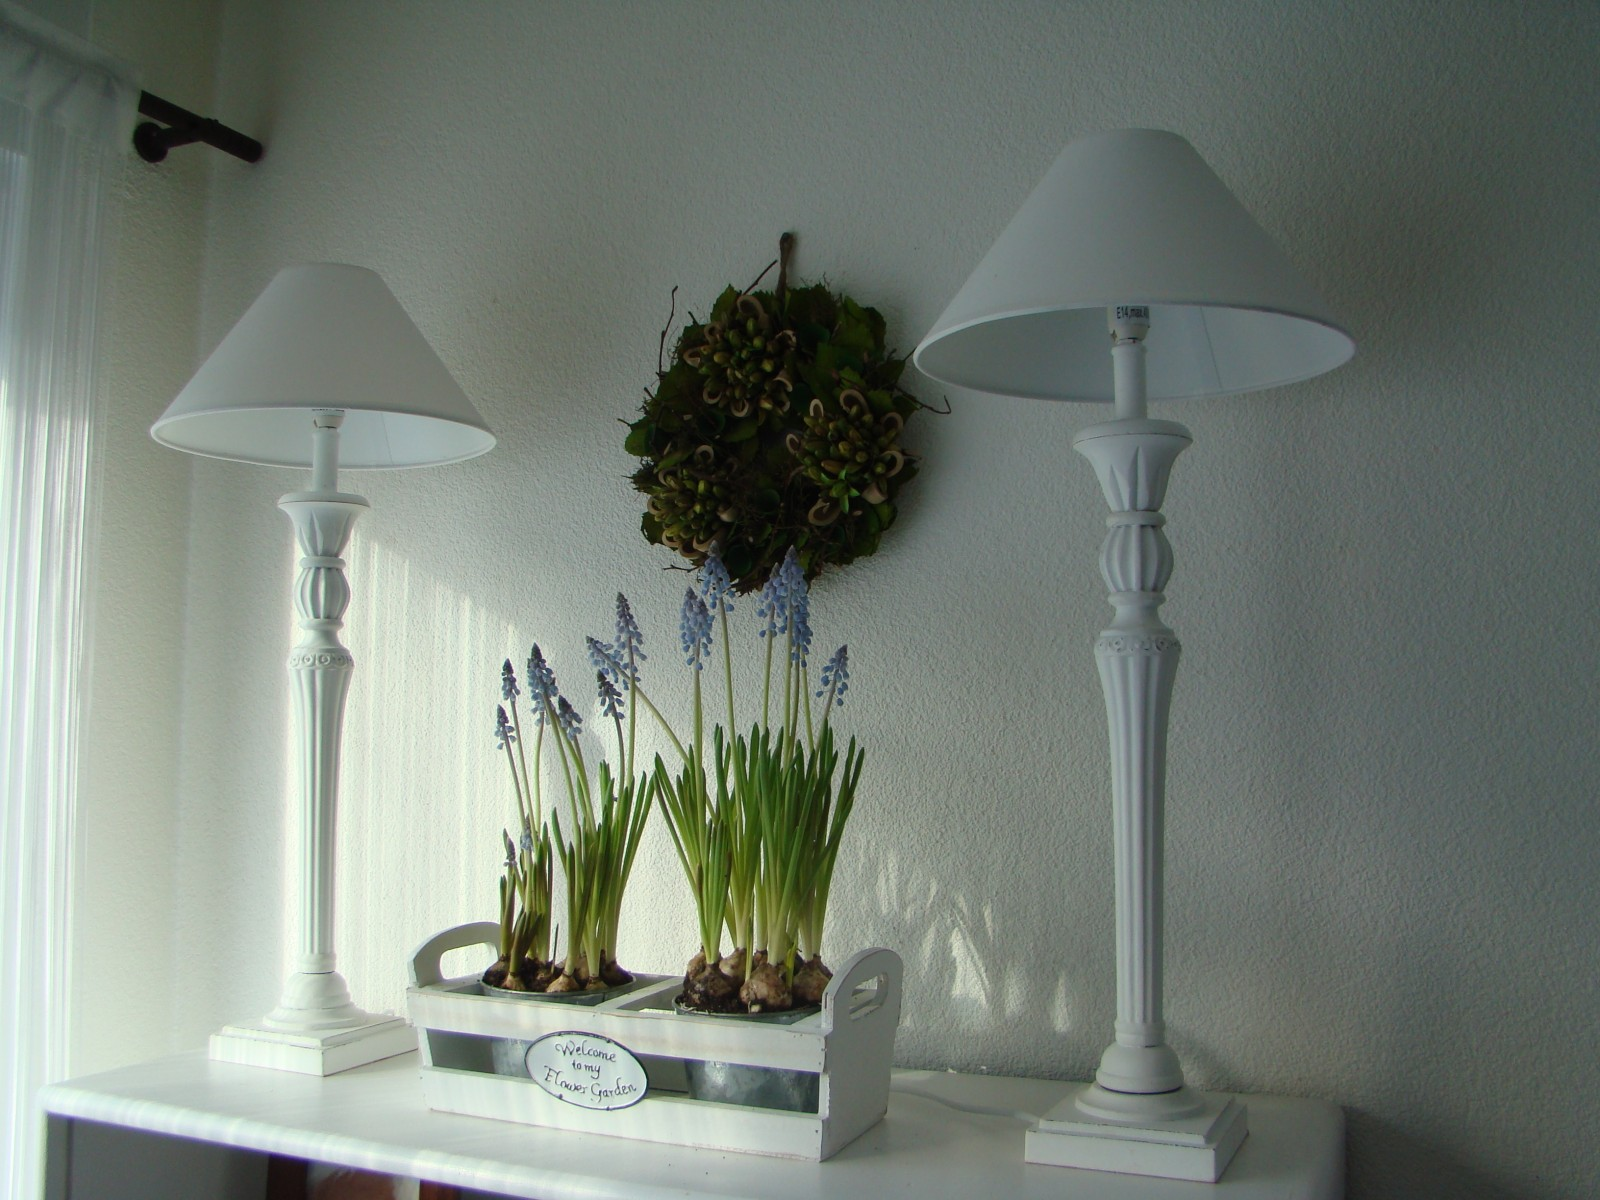 deko 39 fr hling 39 mein domizil zimmerschau. Black Bedroom Furniture Sets. Home Design Ideas